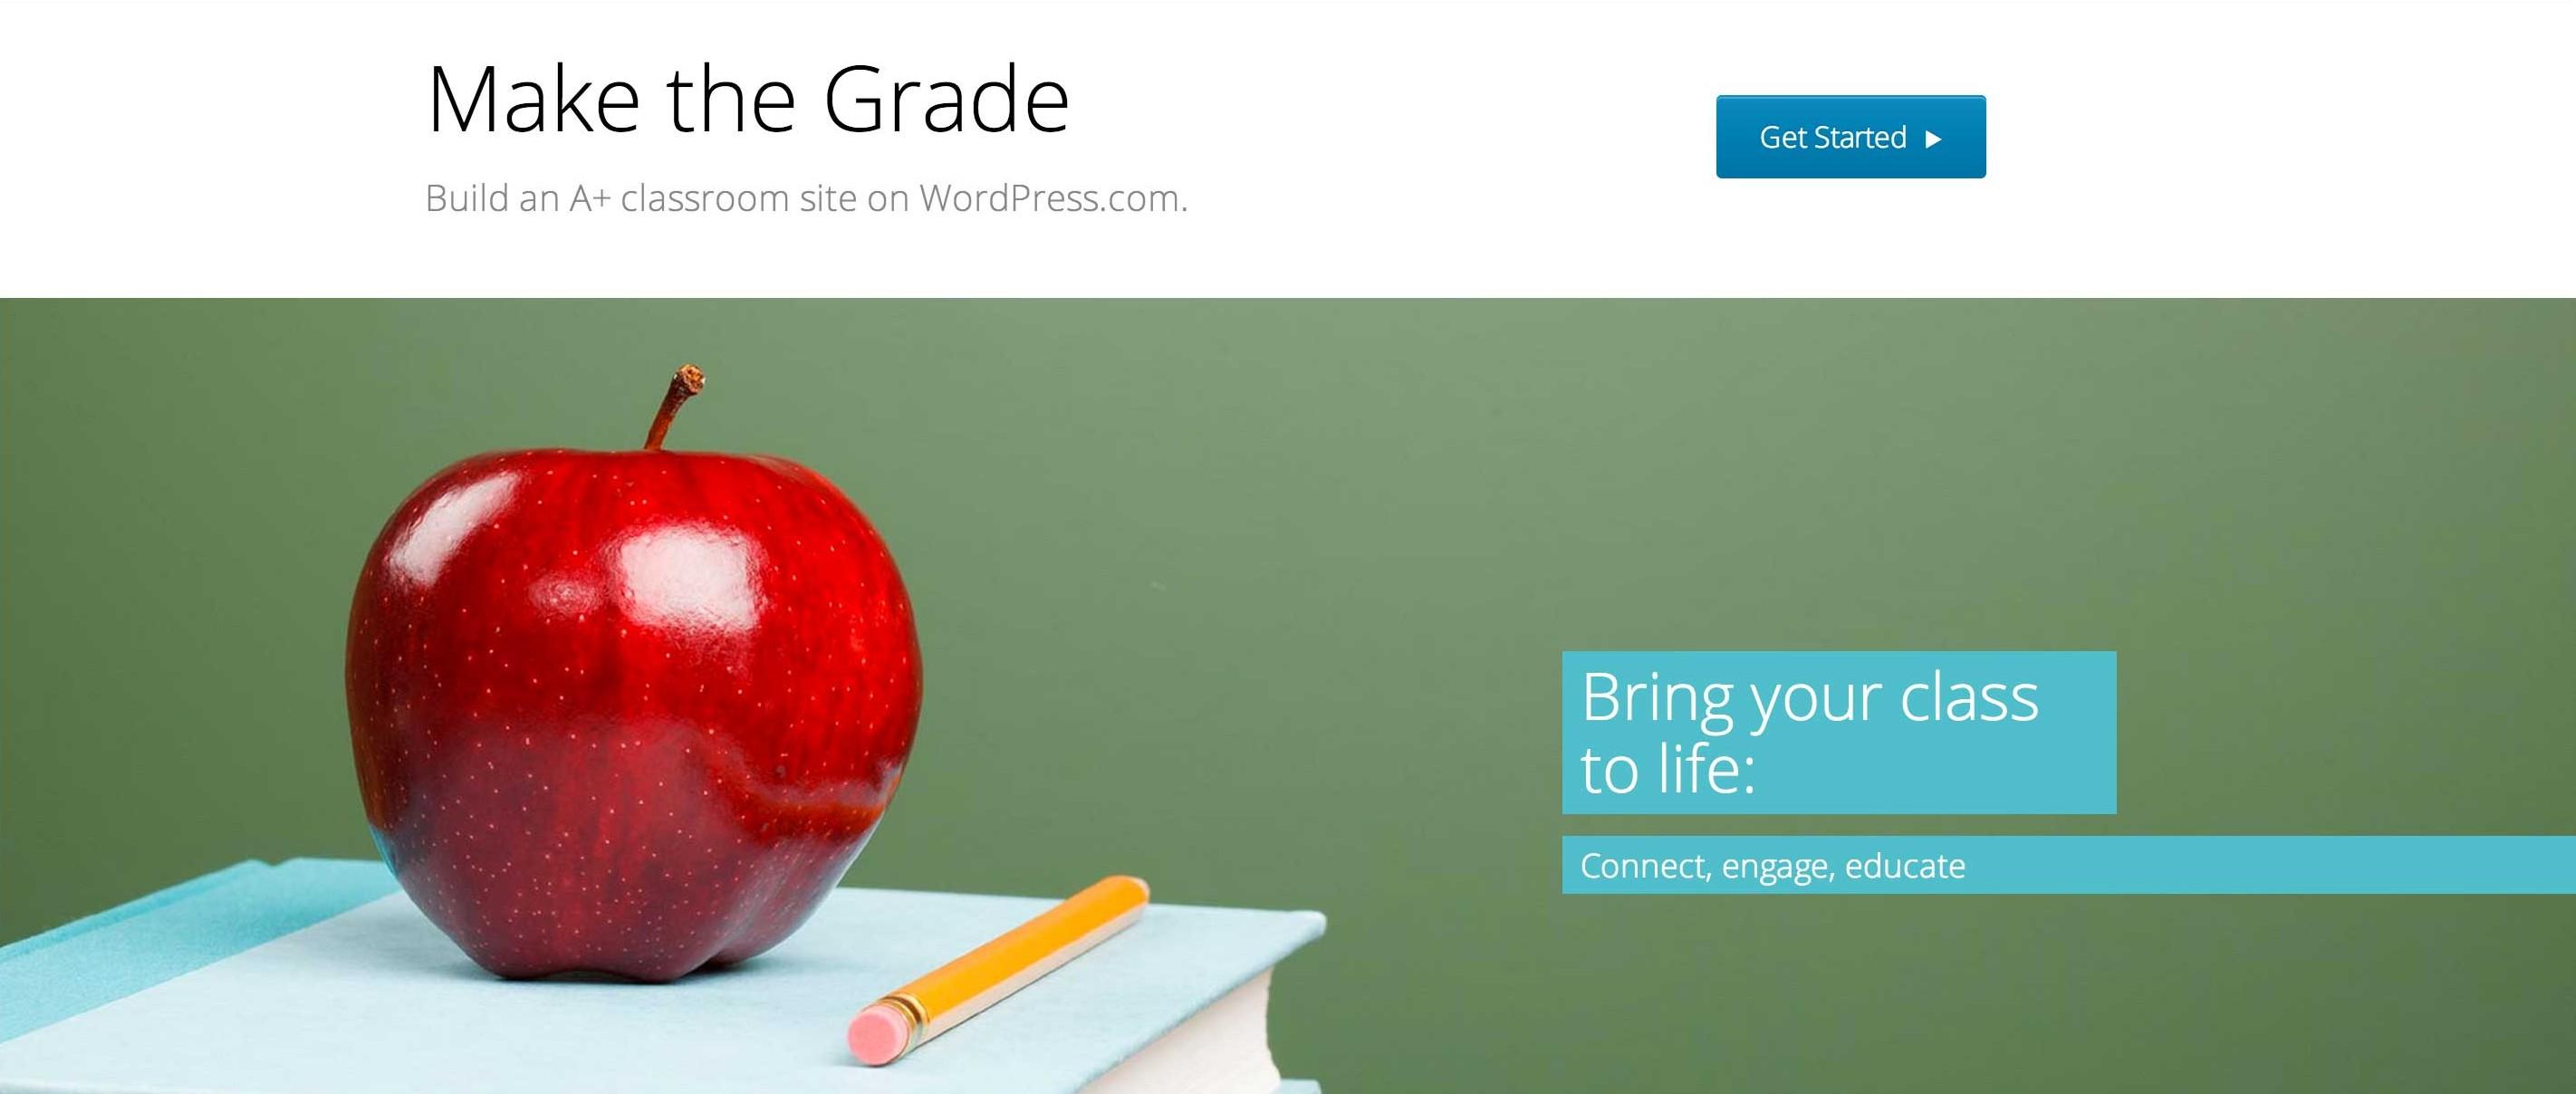 WordPress.com Classrooms